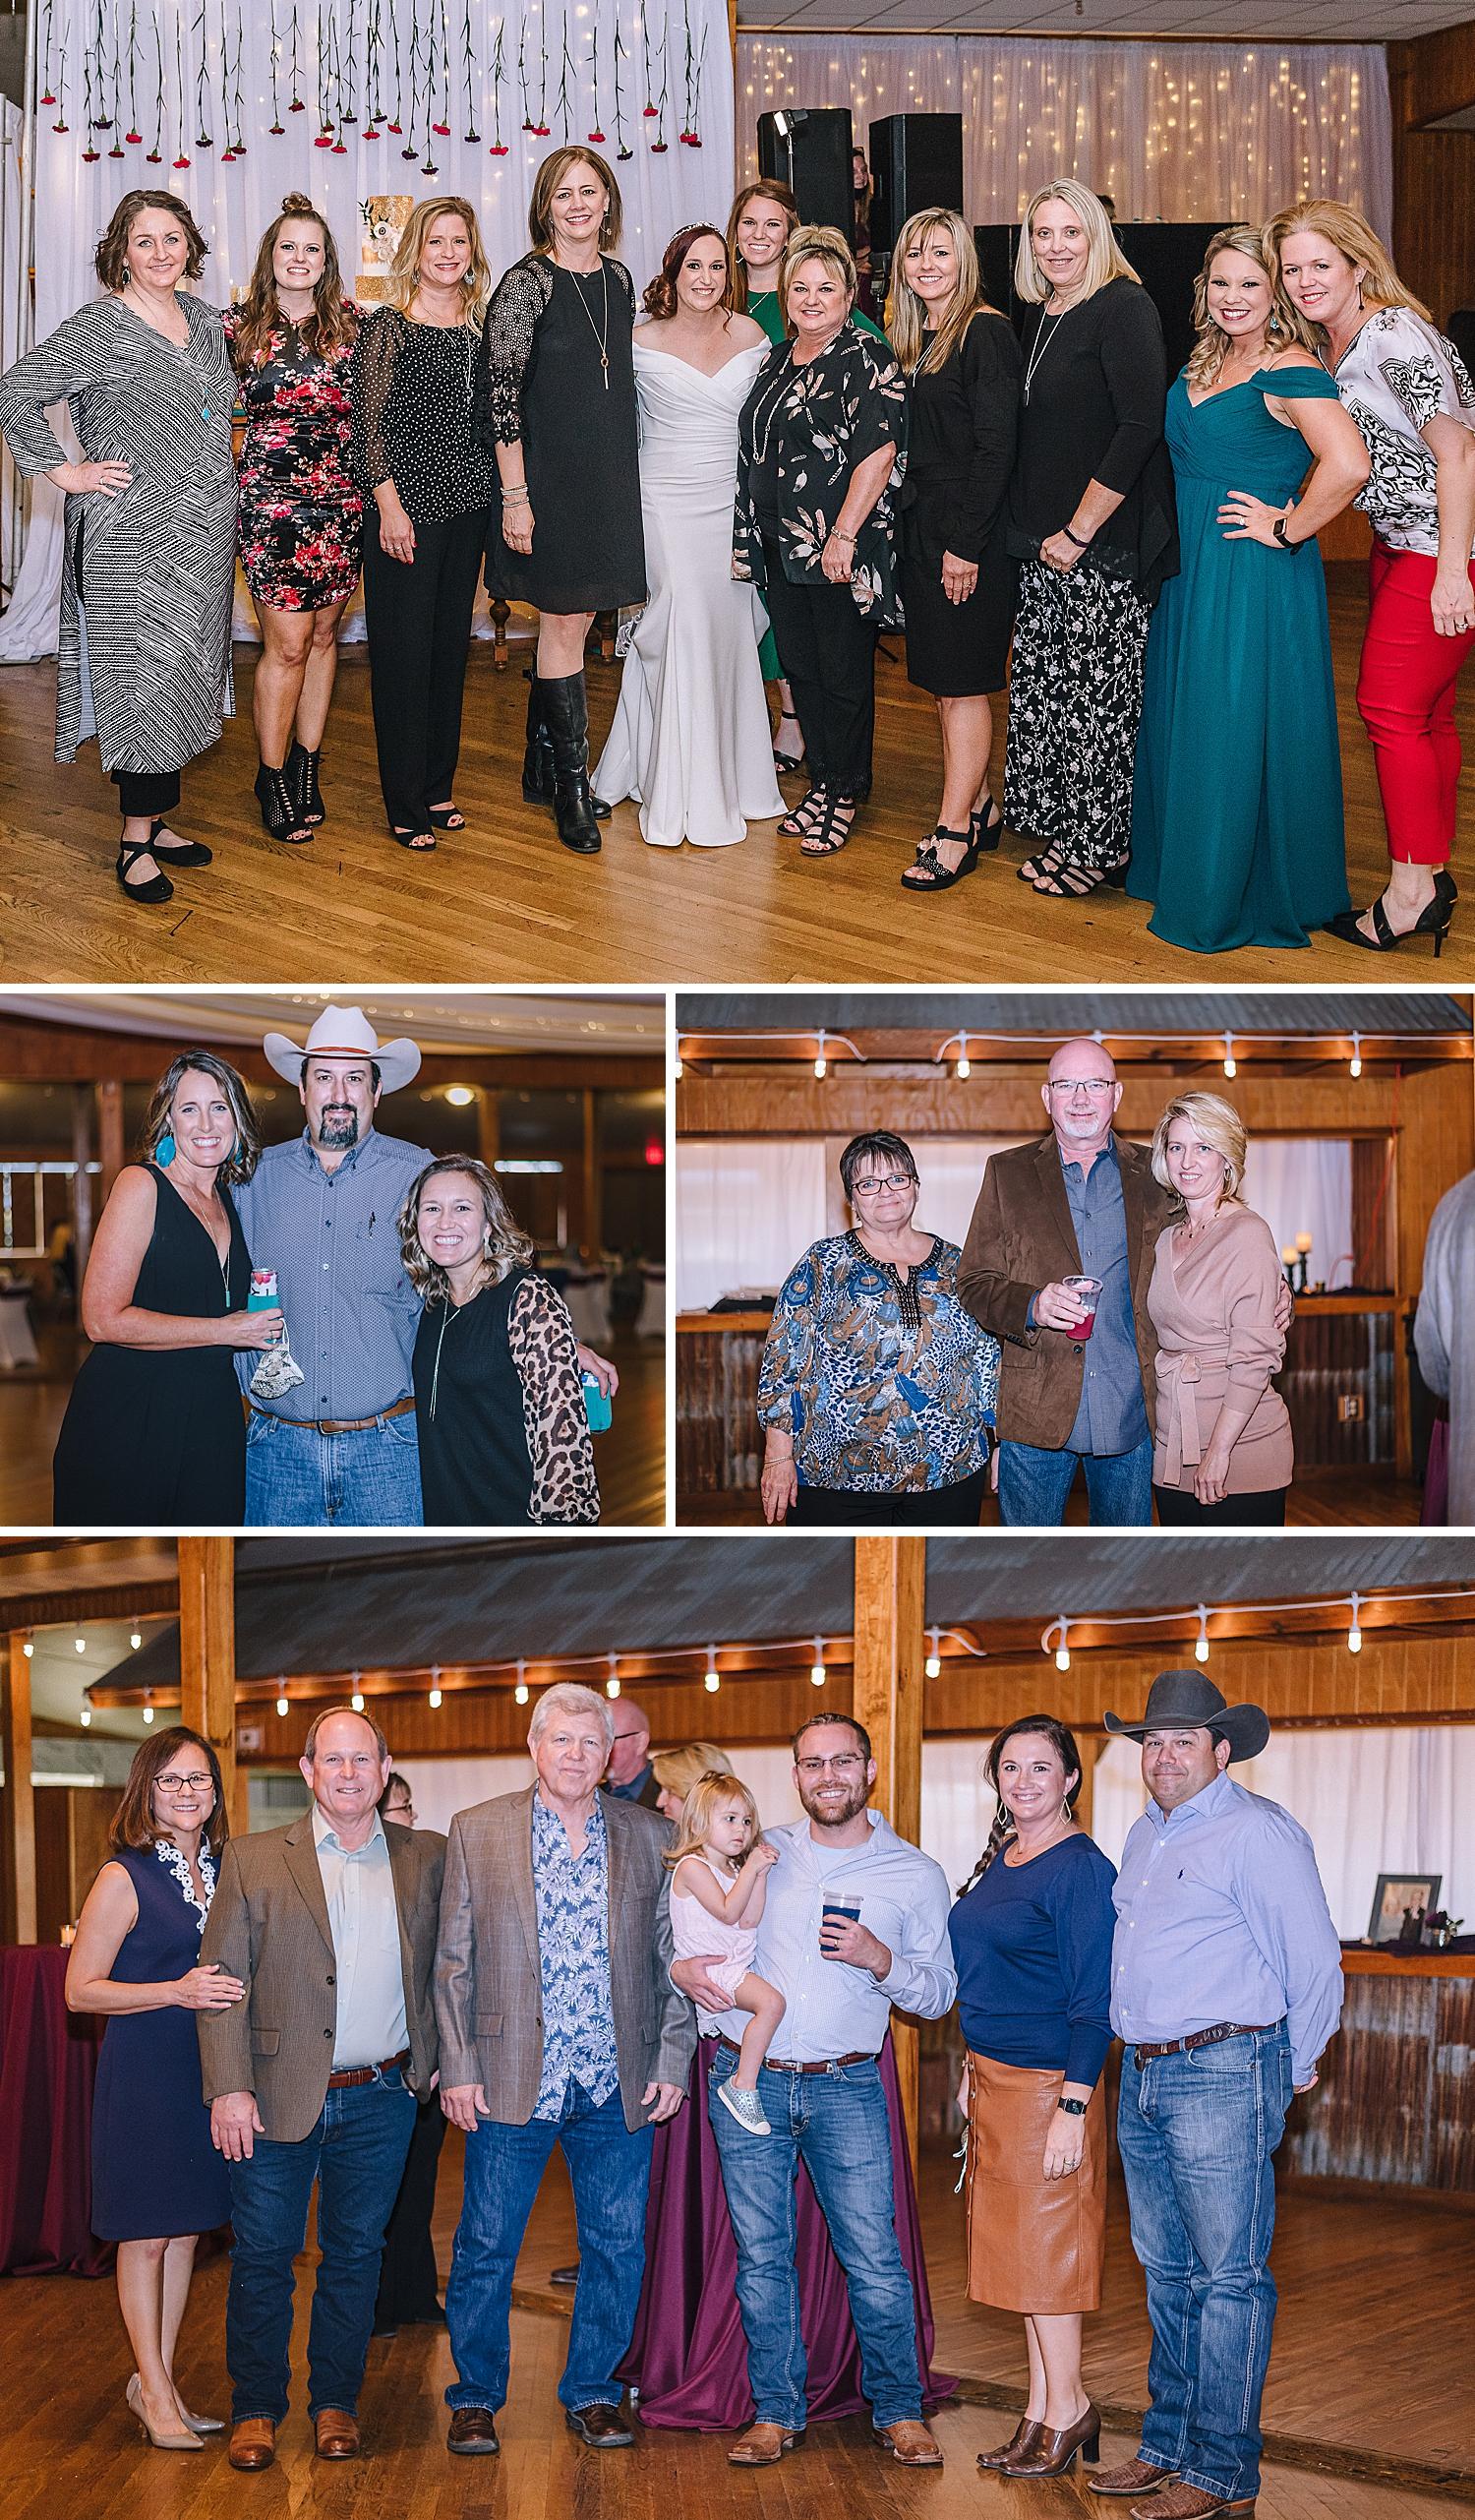 Jewel-Tone-Texas-Wedding-Valerie-Jason-Carly-Barton-Photography_0069.jpg